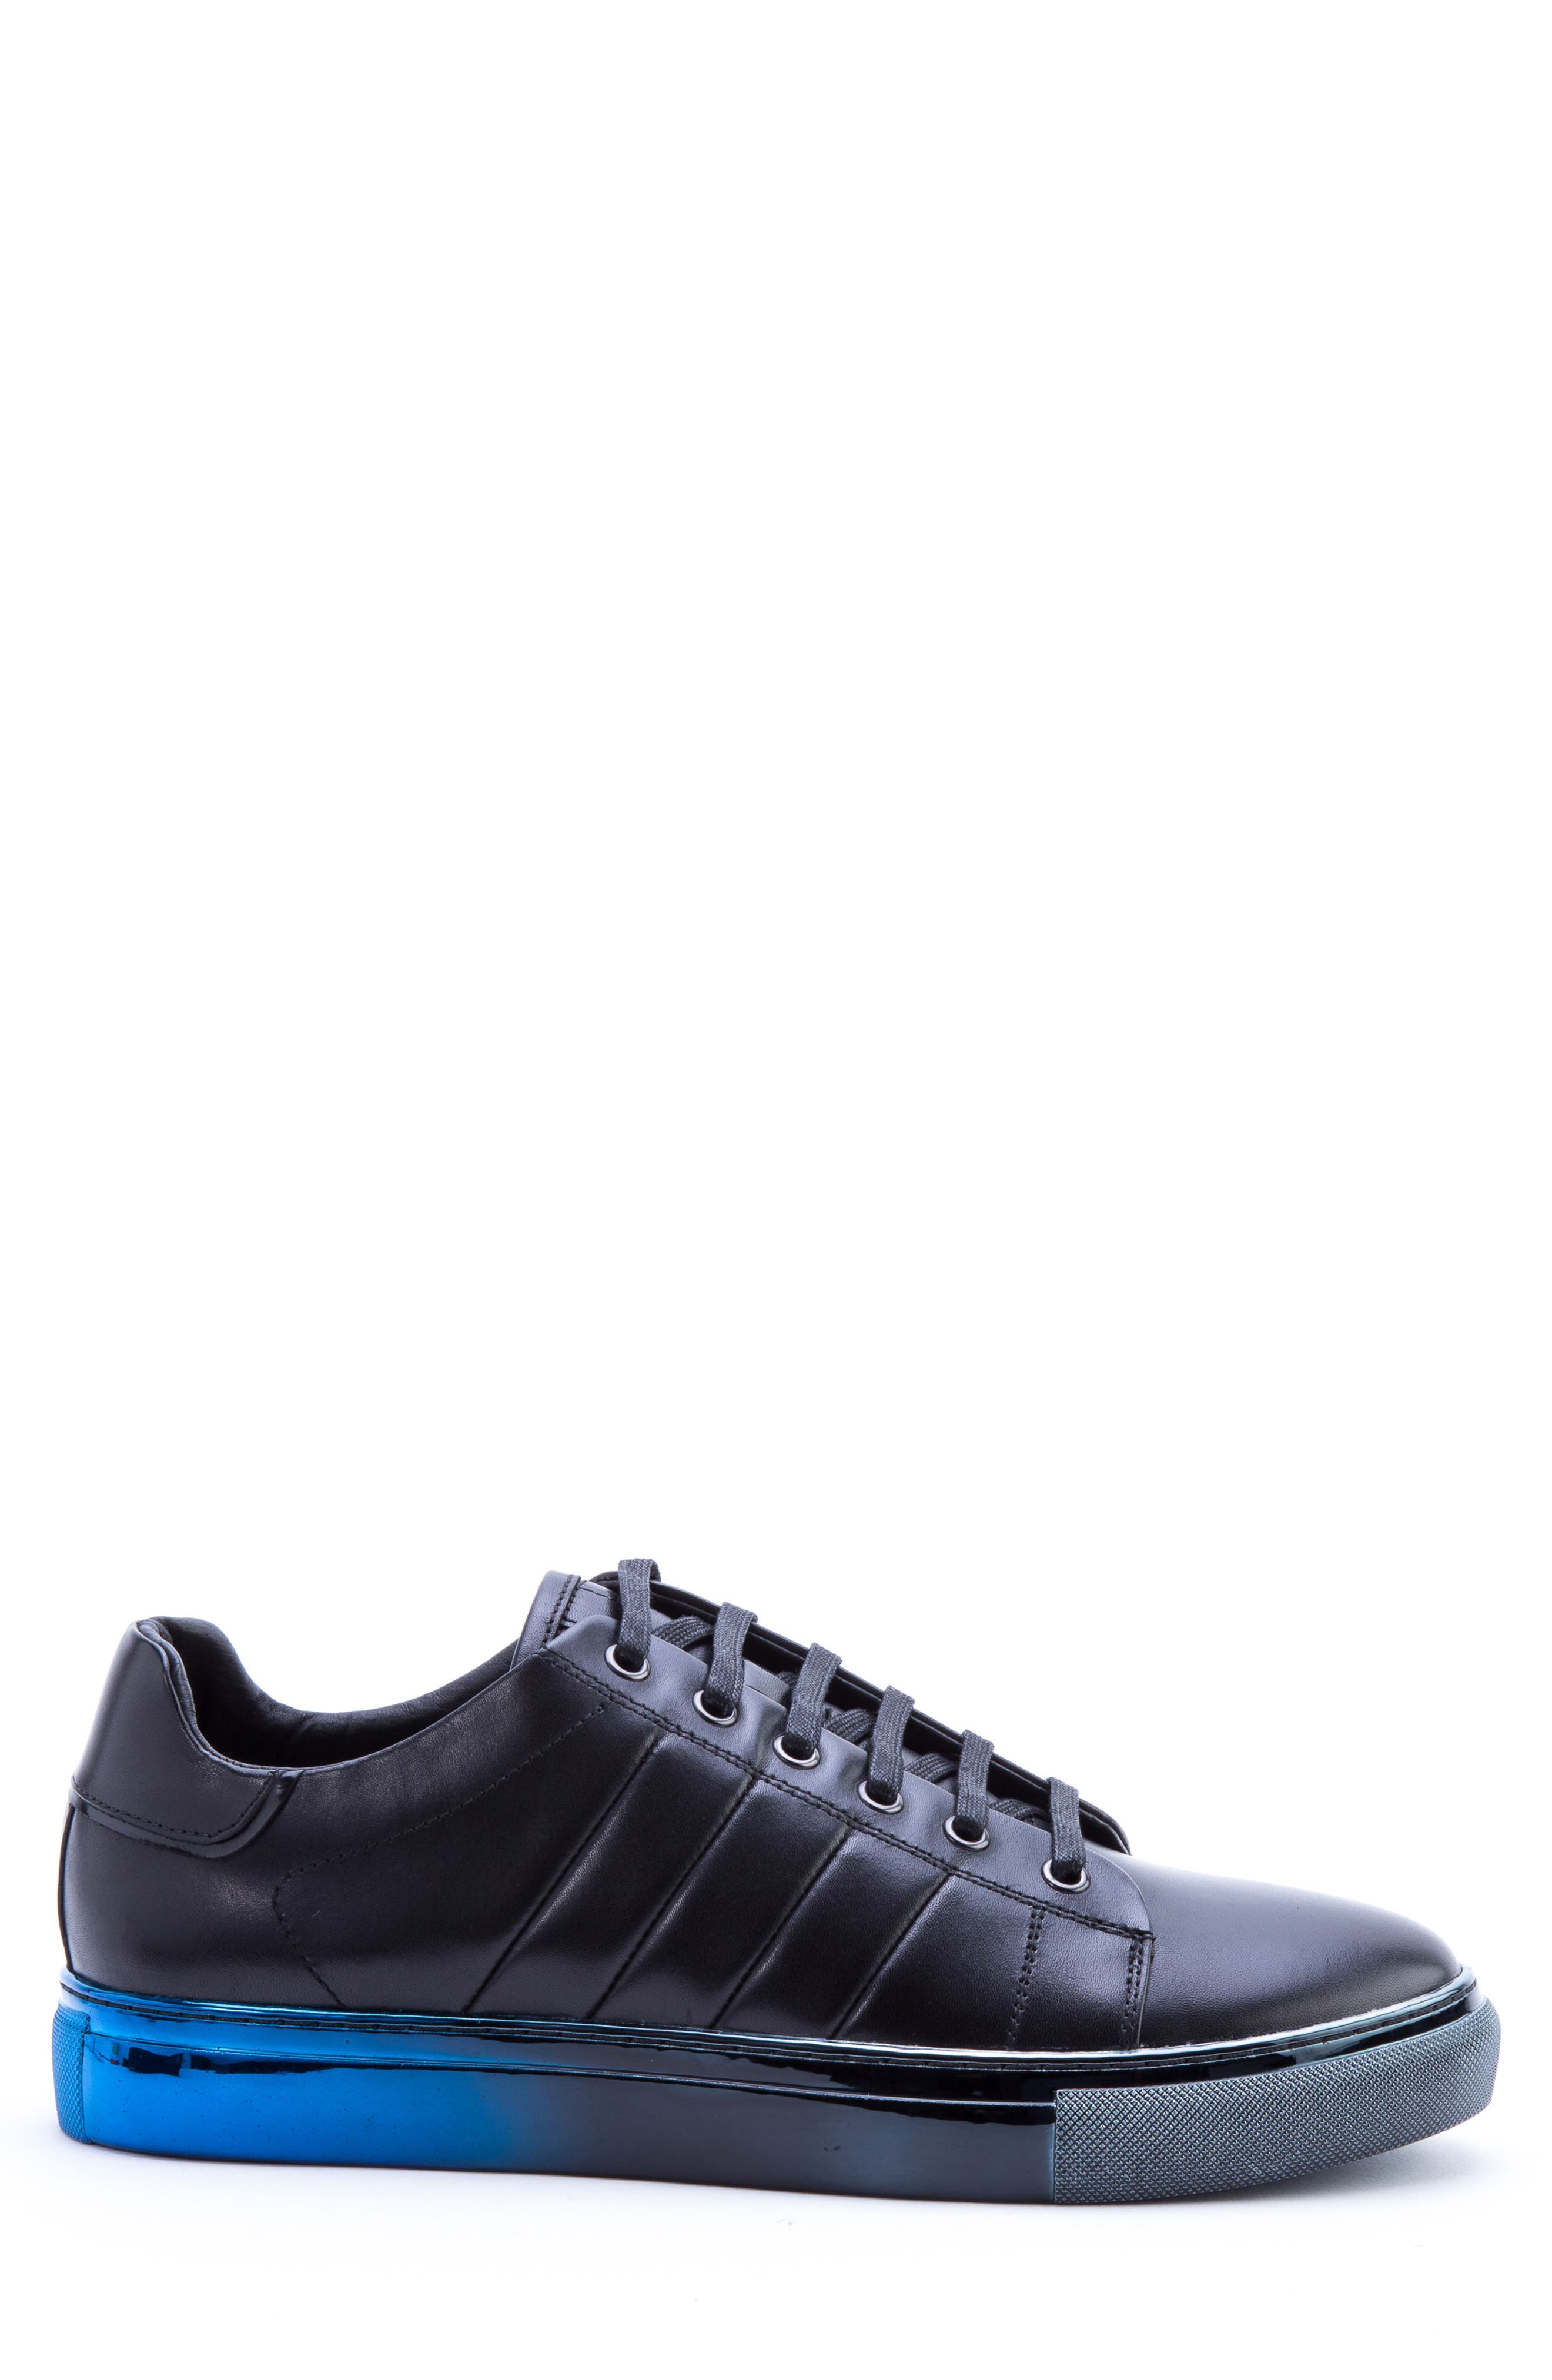 Badgley Mischka Brando Sneaker,                             Alternate thumbnail 3, color,                             BLACK LEATHER